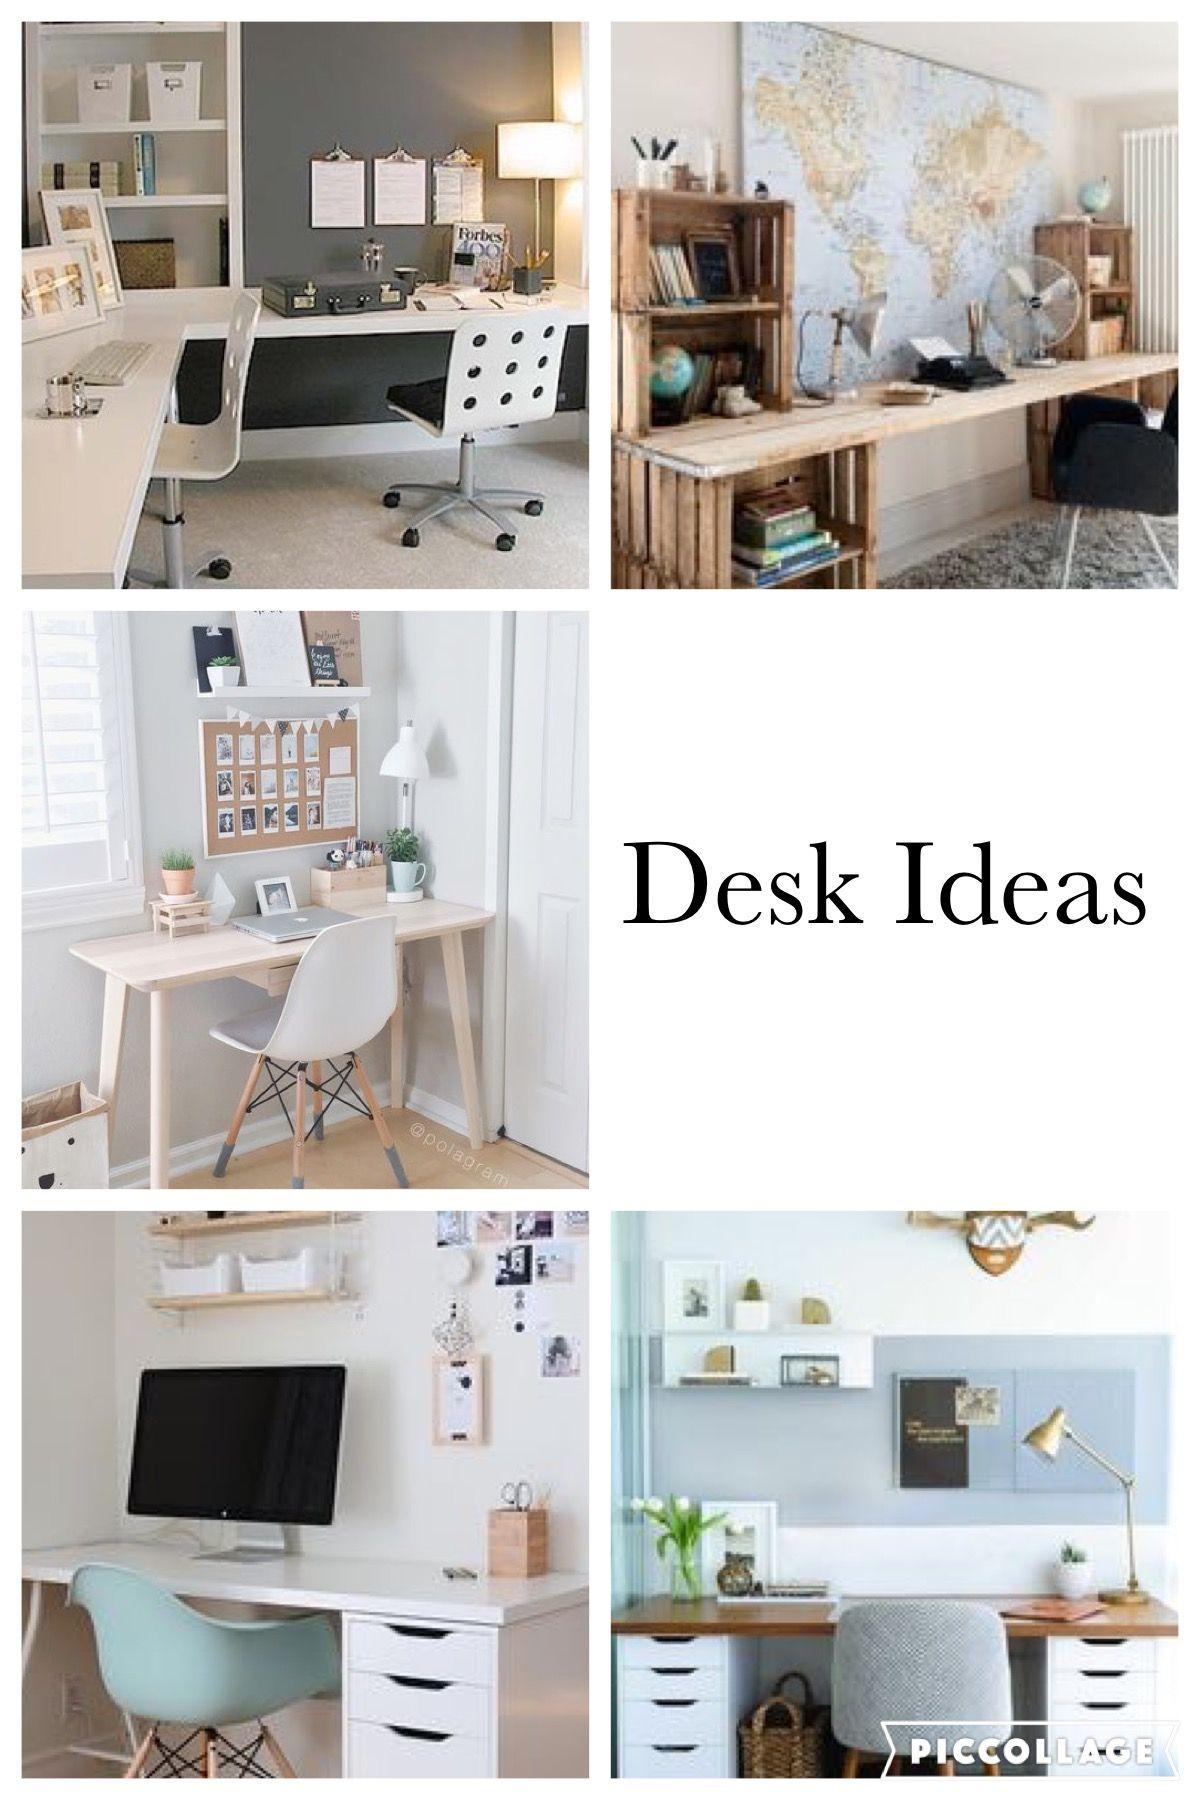 Inspiration for room/desk